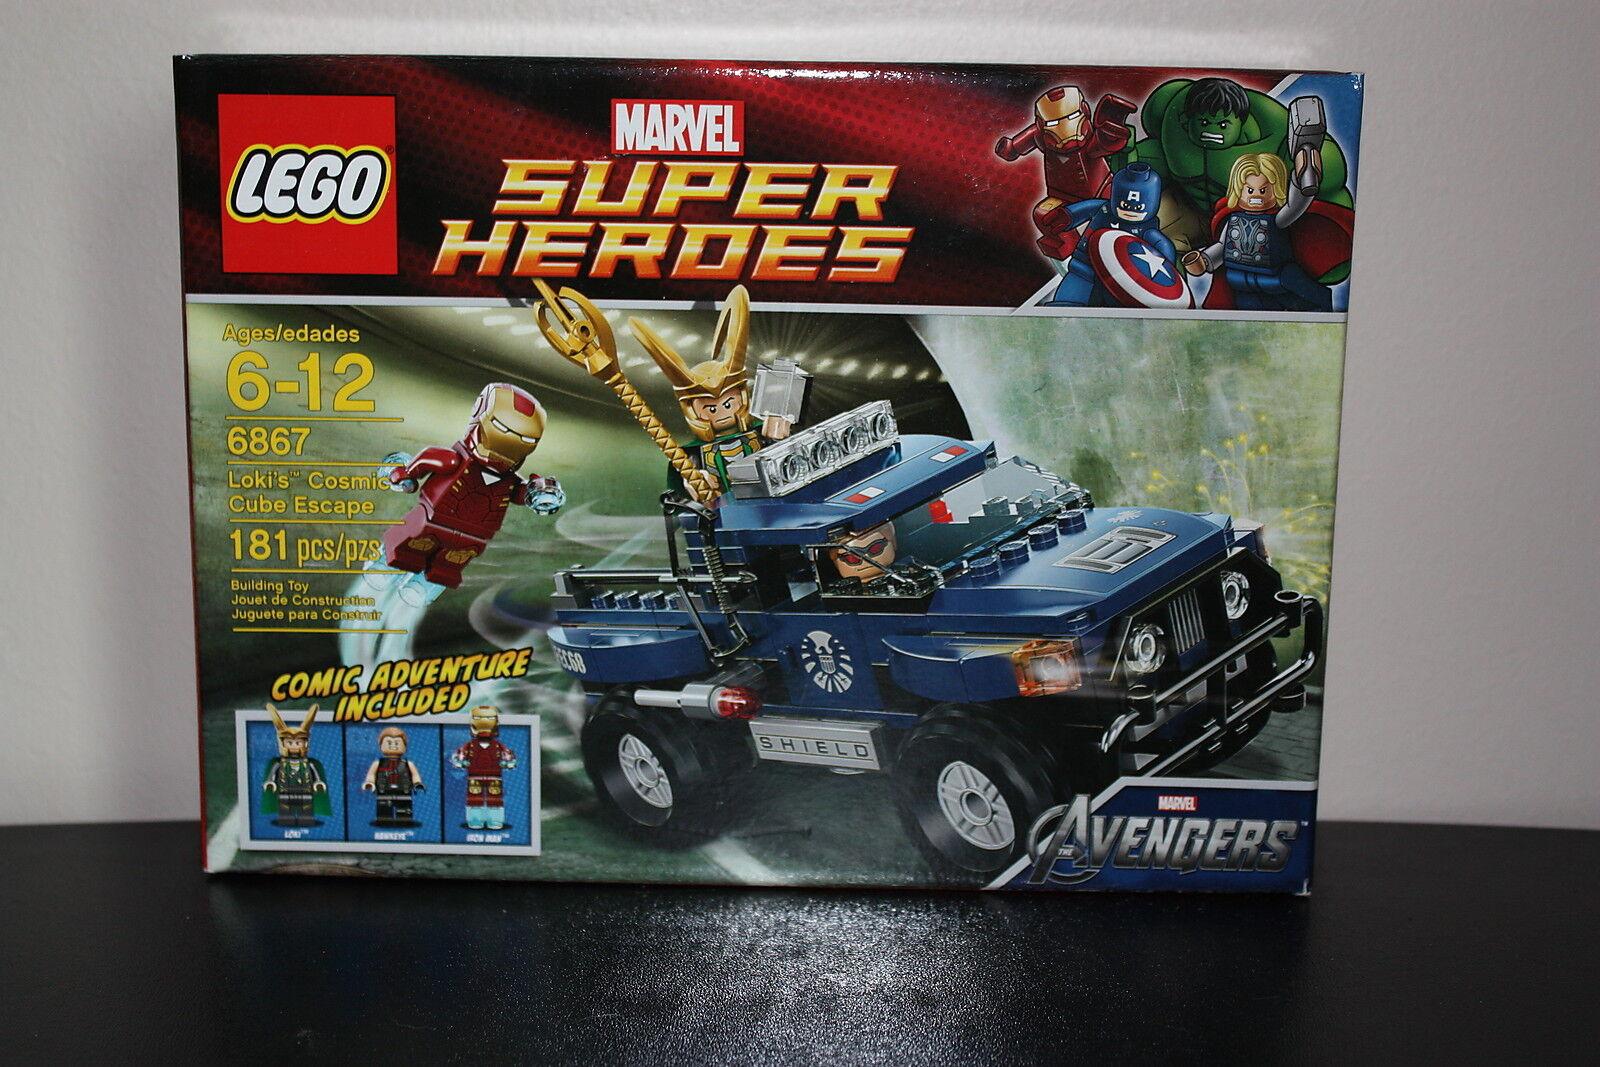 Lego Marvel Super Heroes 6867 Loki's Cosmic Cube Escape 181 Pcs